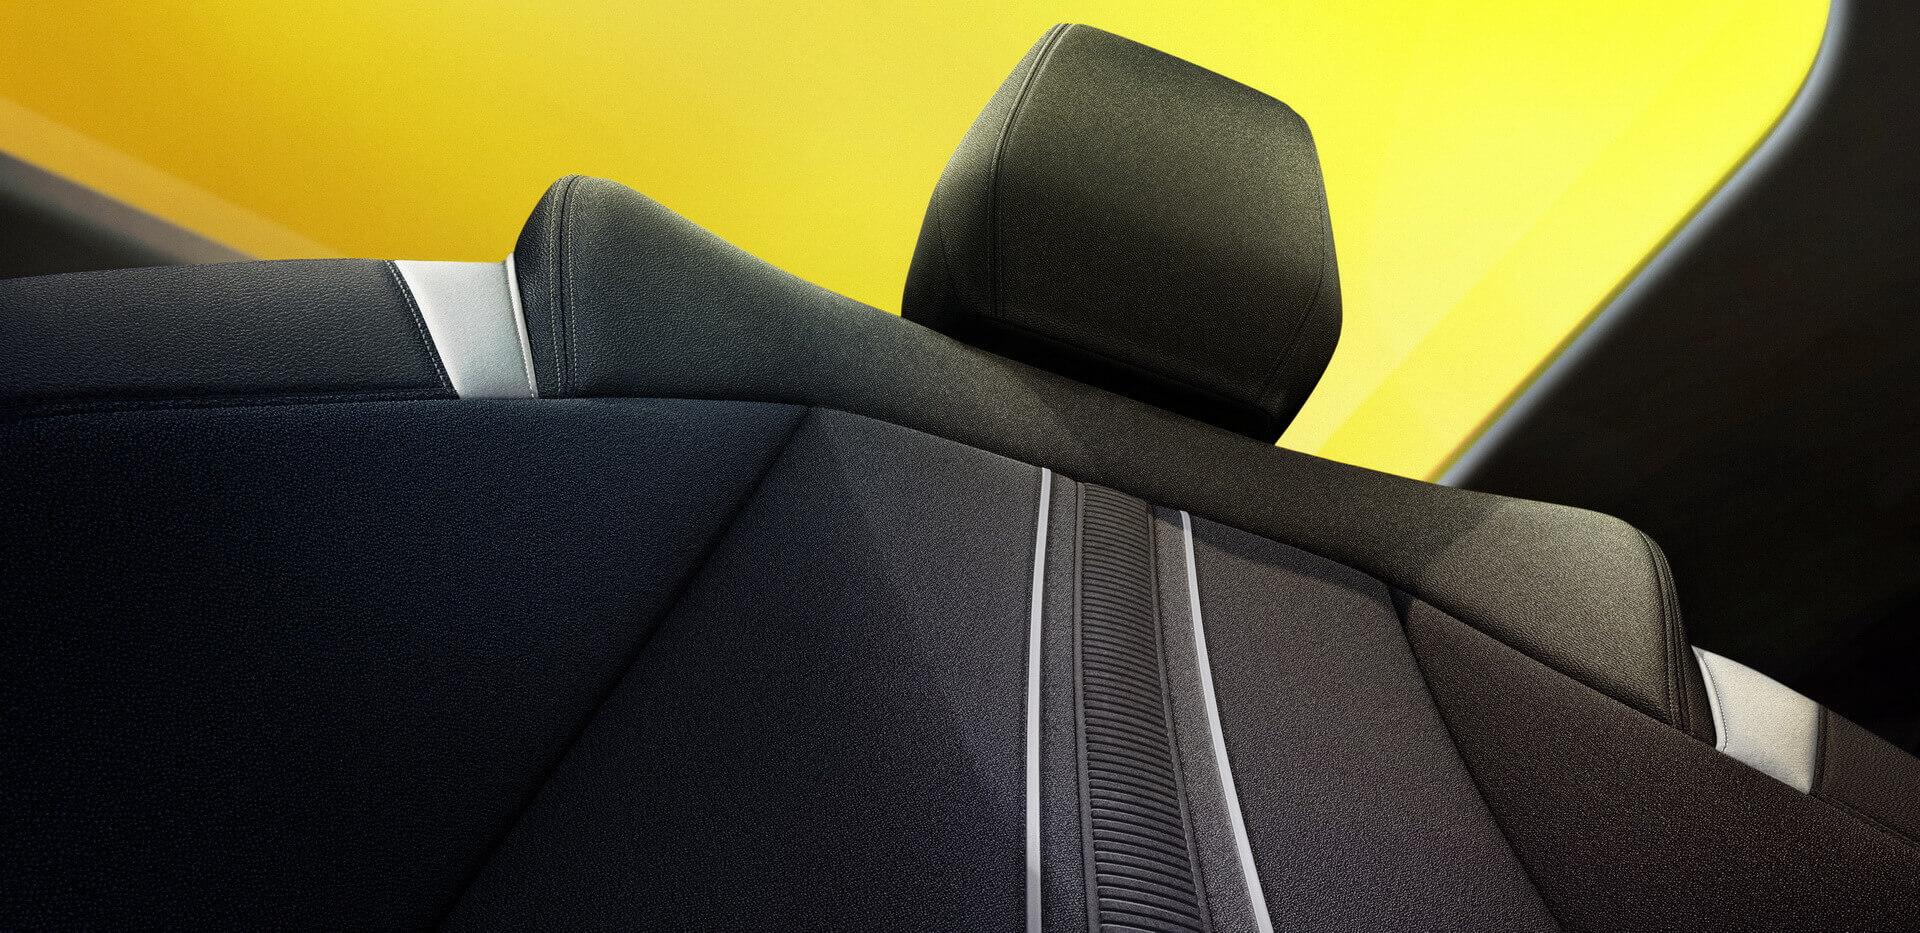 Салон новой Opel Astra